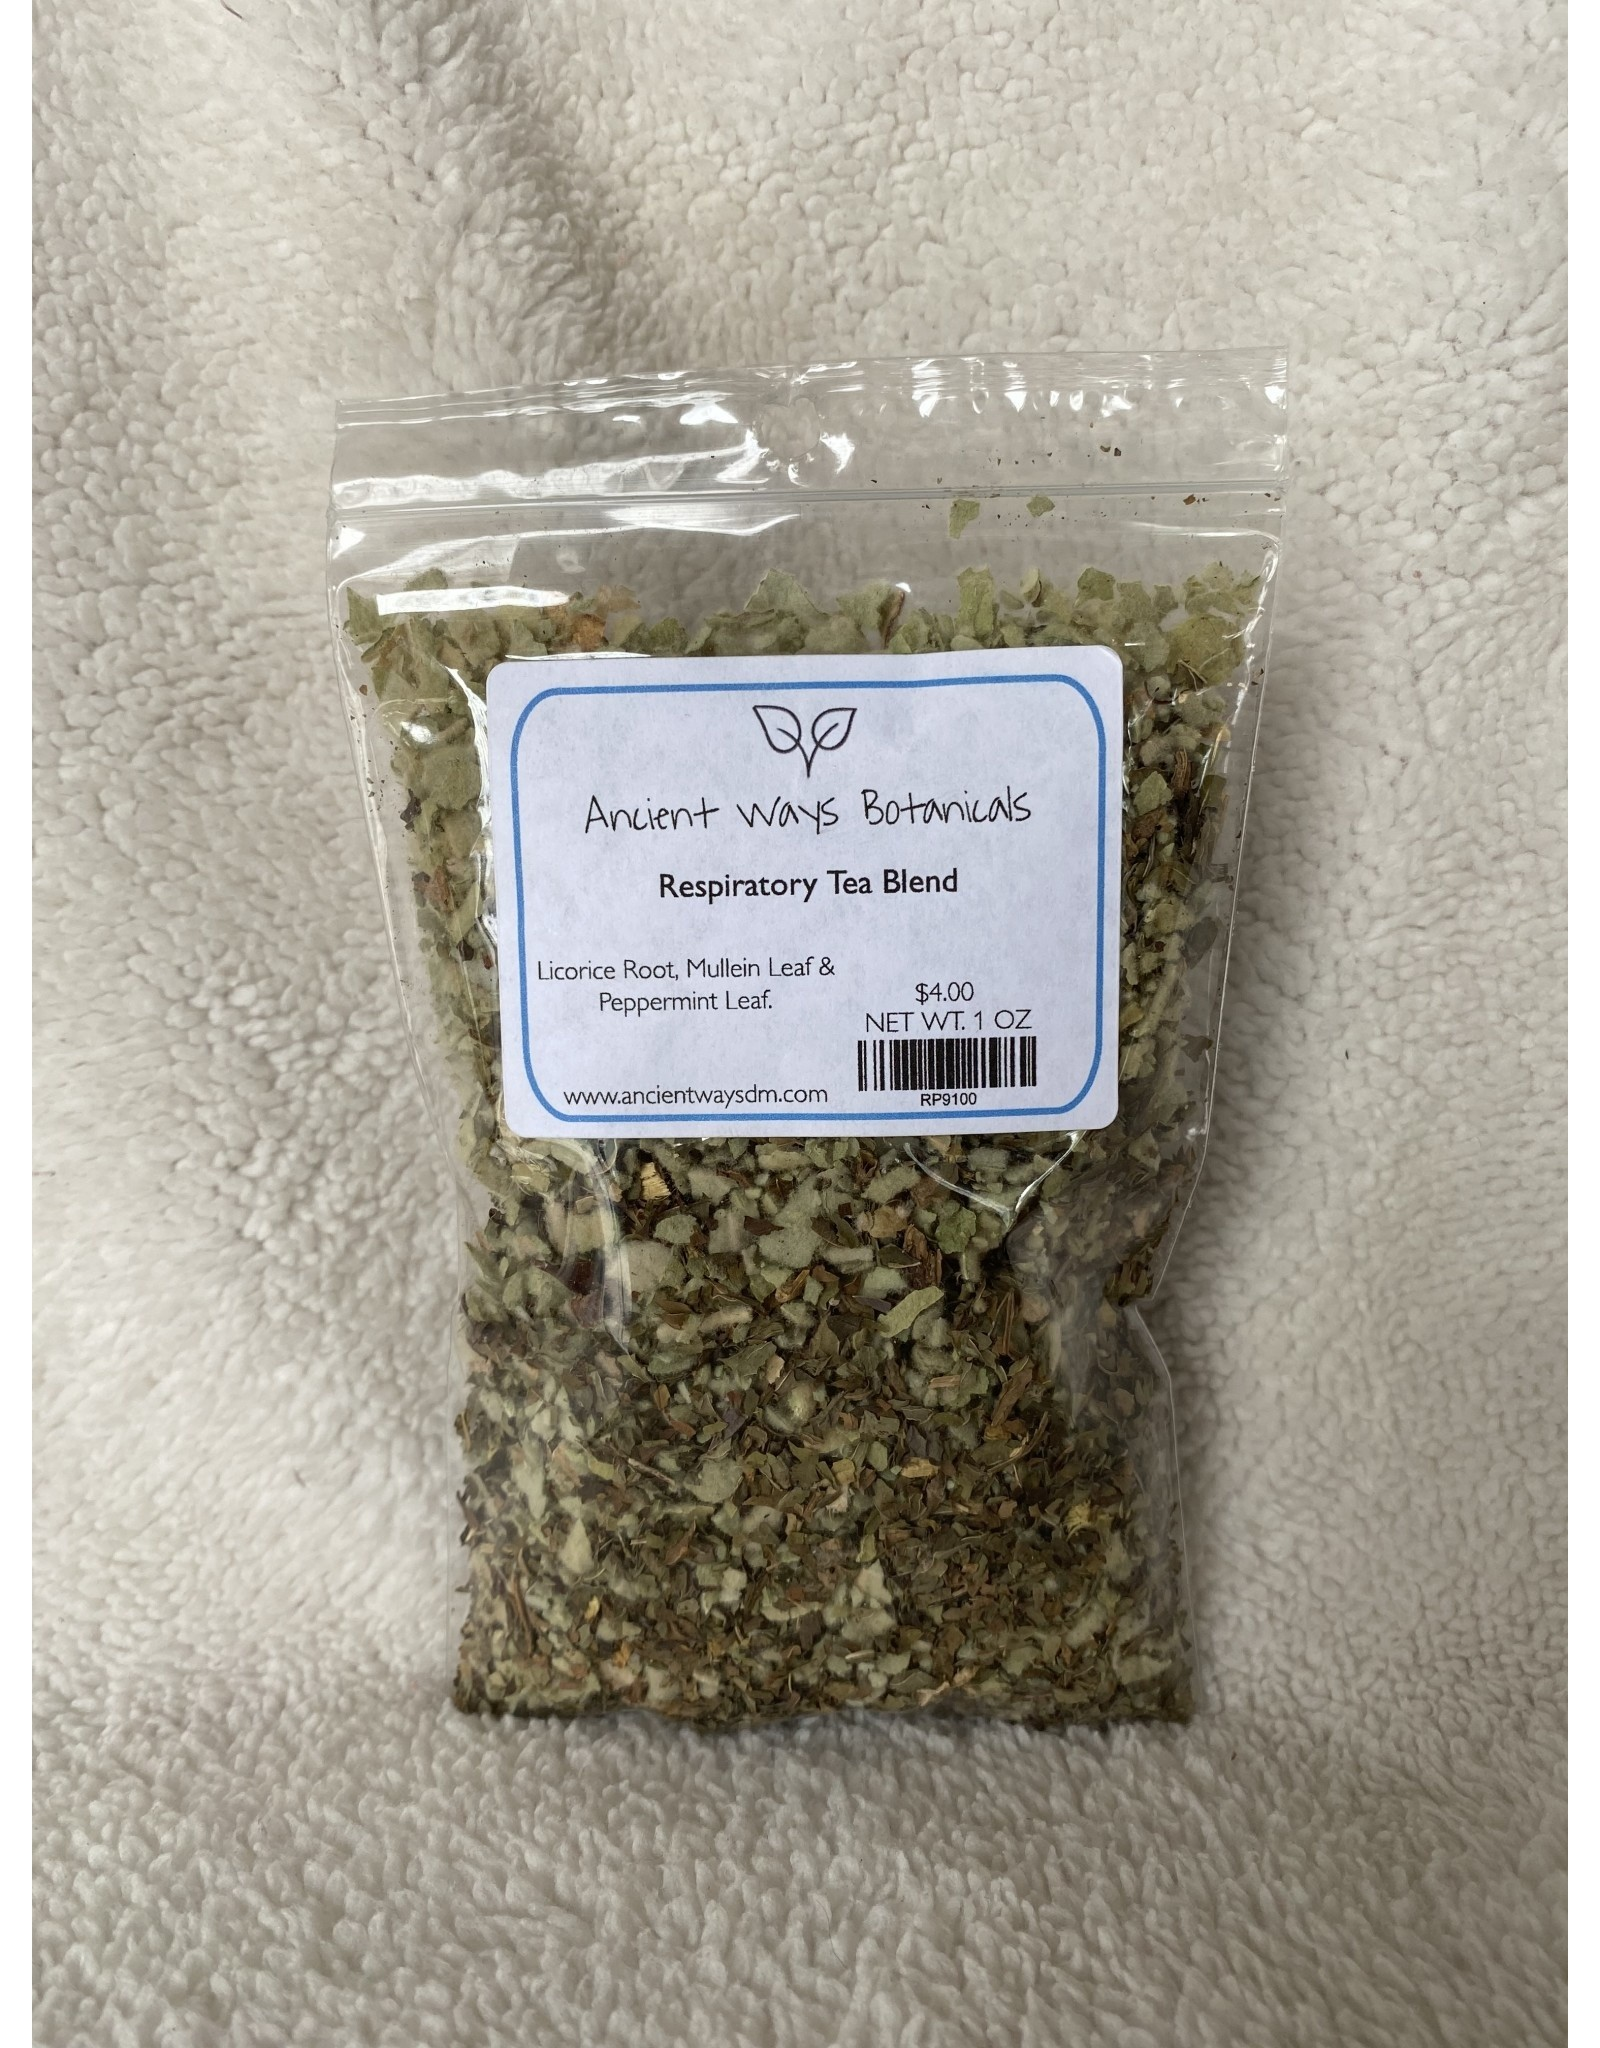 Respiratory Tea Blend - 1 oz.